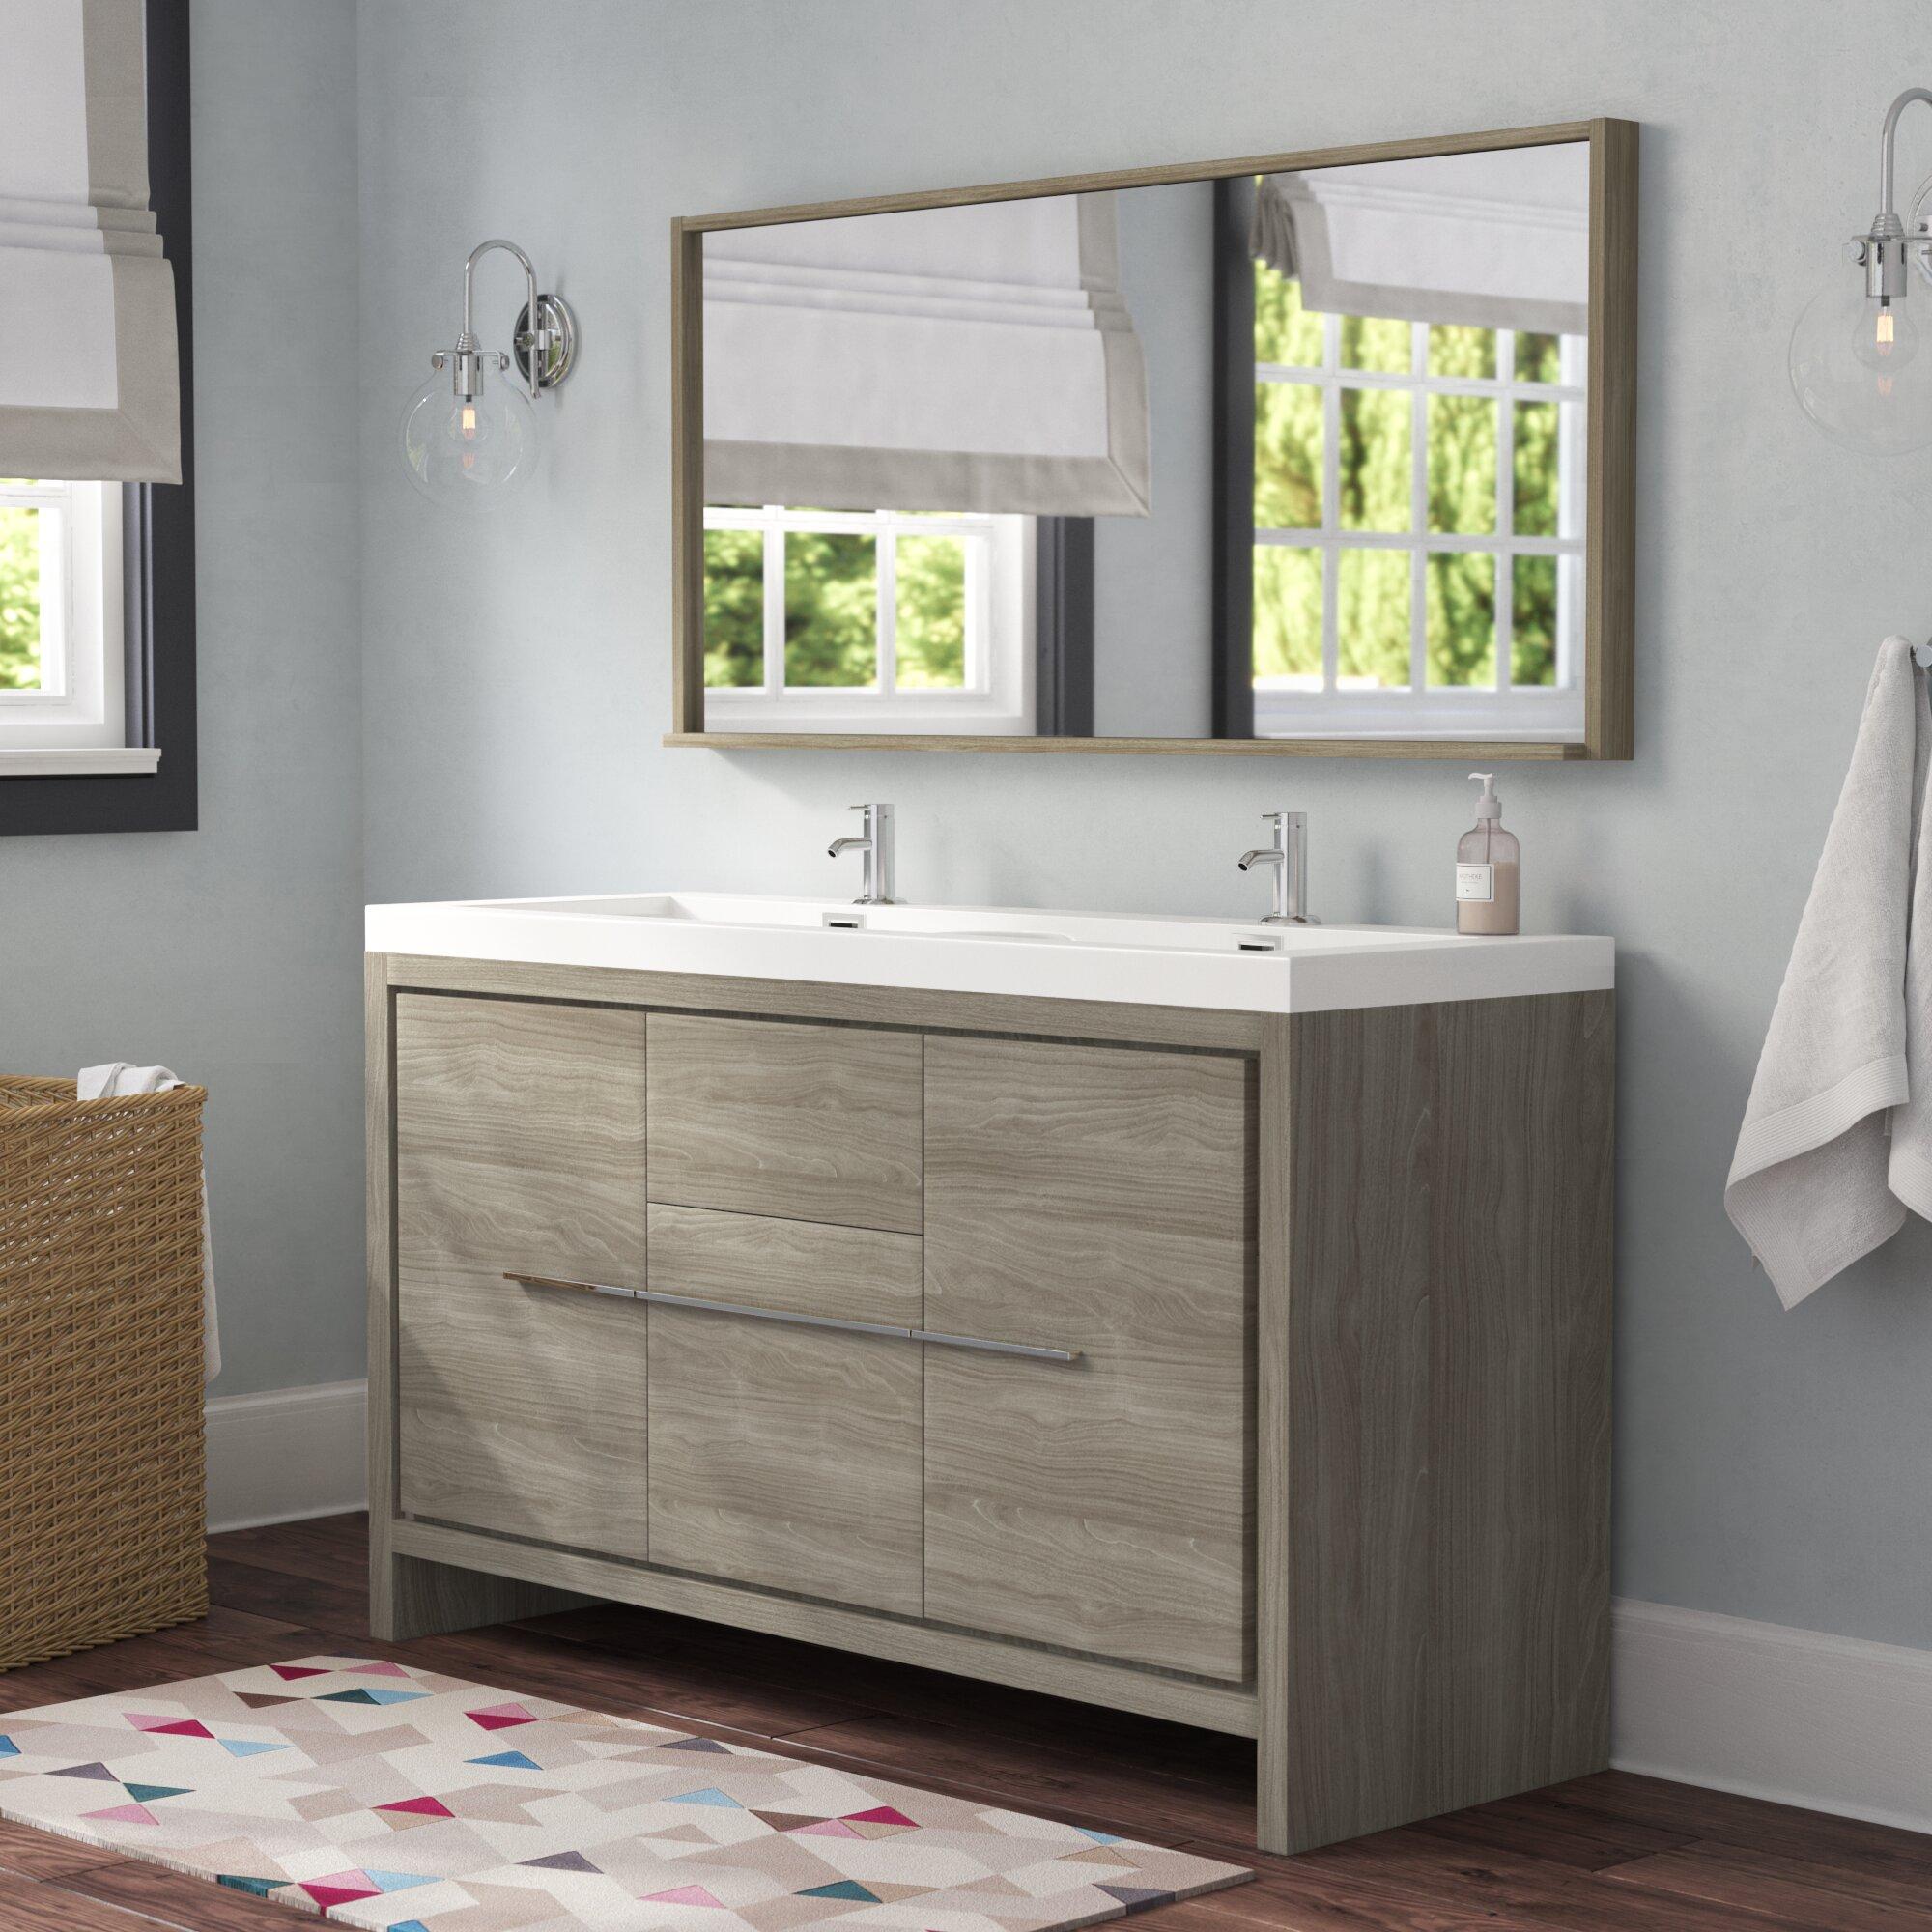 Stupendous Waldwick 57 Double Modern Bathroom Vanity Set With Mirror Download Free Architecture Designs Scobabritishbridgeorg